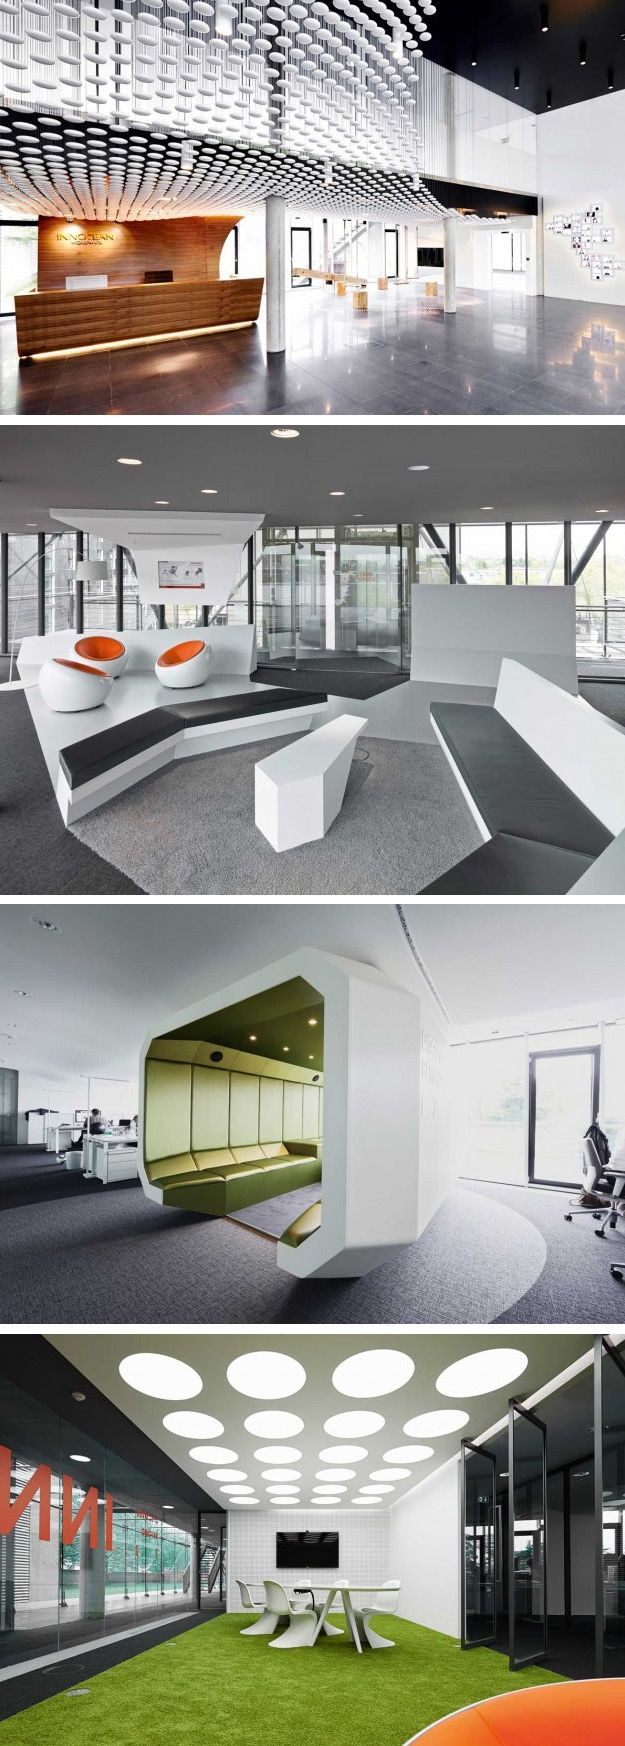 Innocean headquarters by ippolito fleitz group workplace for Ippolito fleitz group